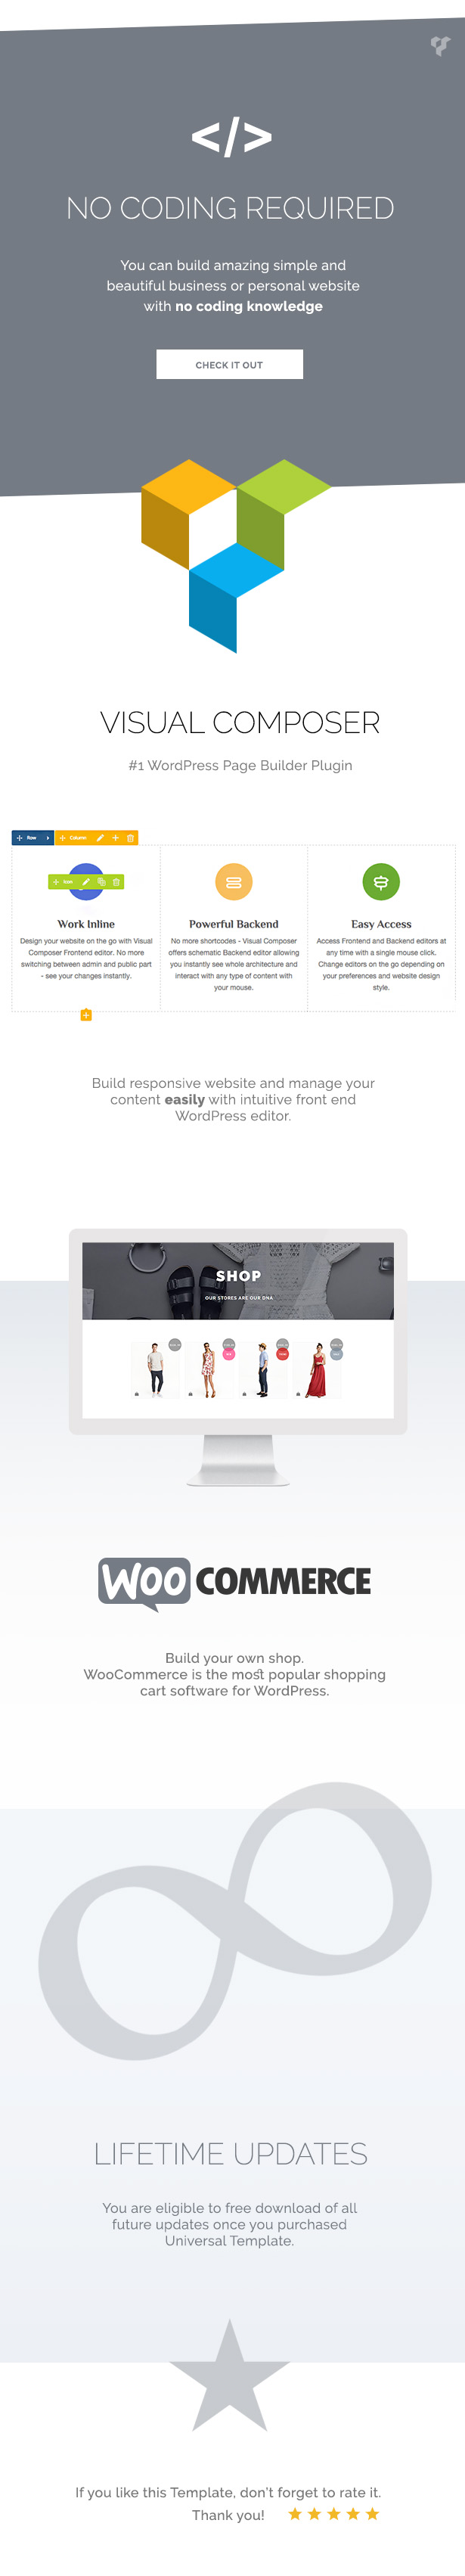 Universal - Smart Multi-Purpose WordPress Theme - 6